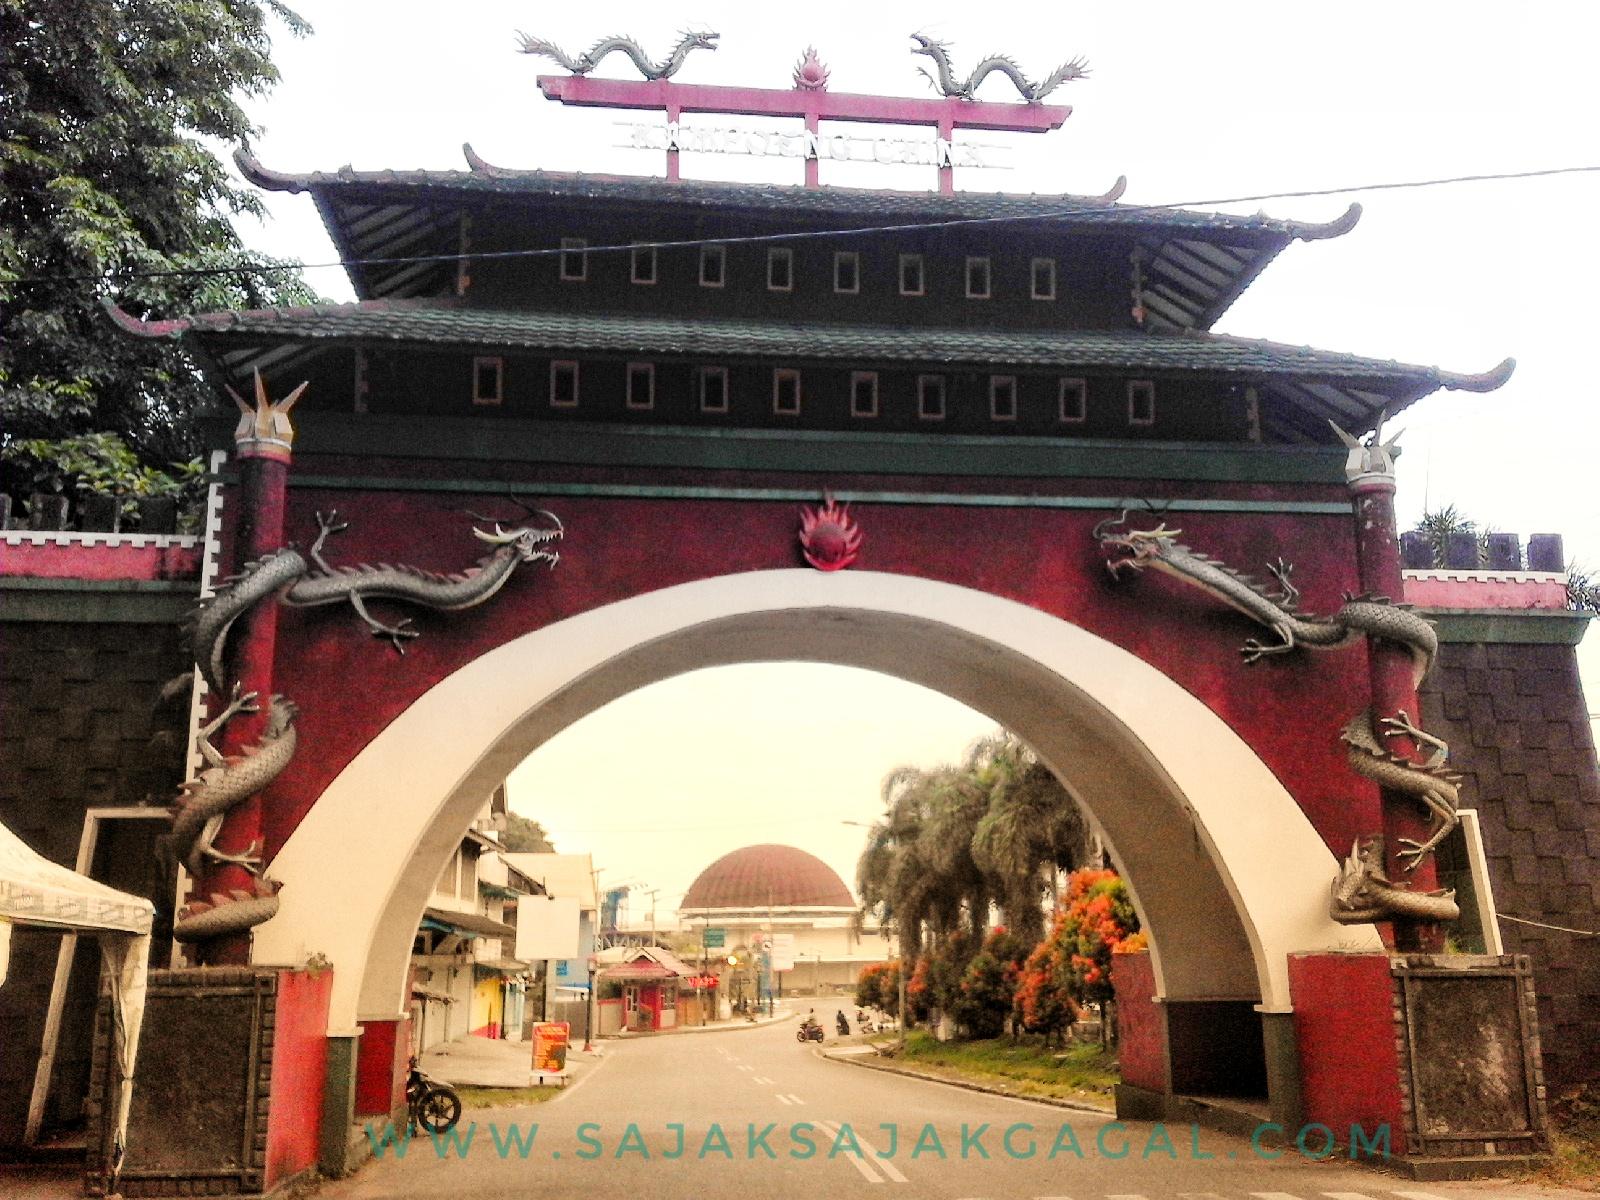 Wajah Kampung Pecinan Bengkulu Blog Junita Susanti Taman Pantai Berkas